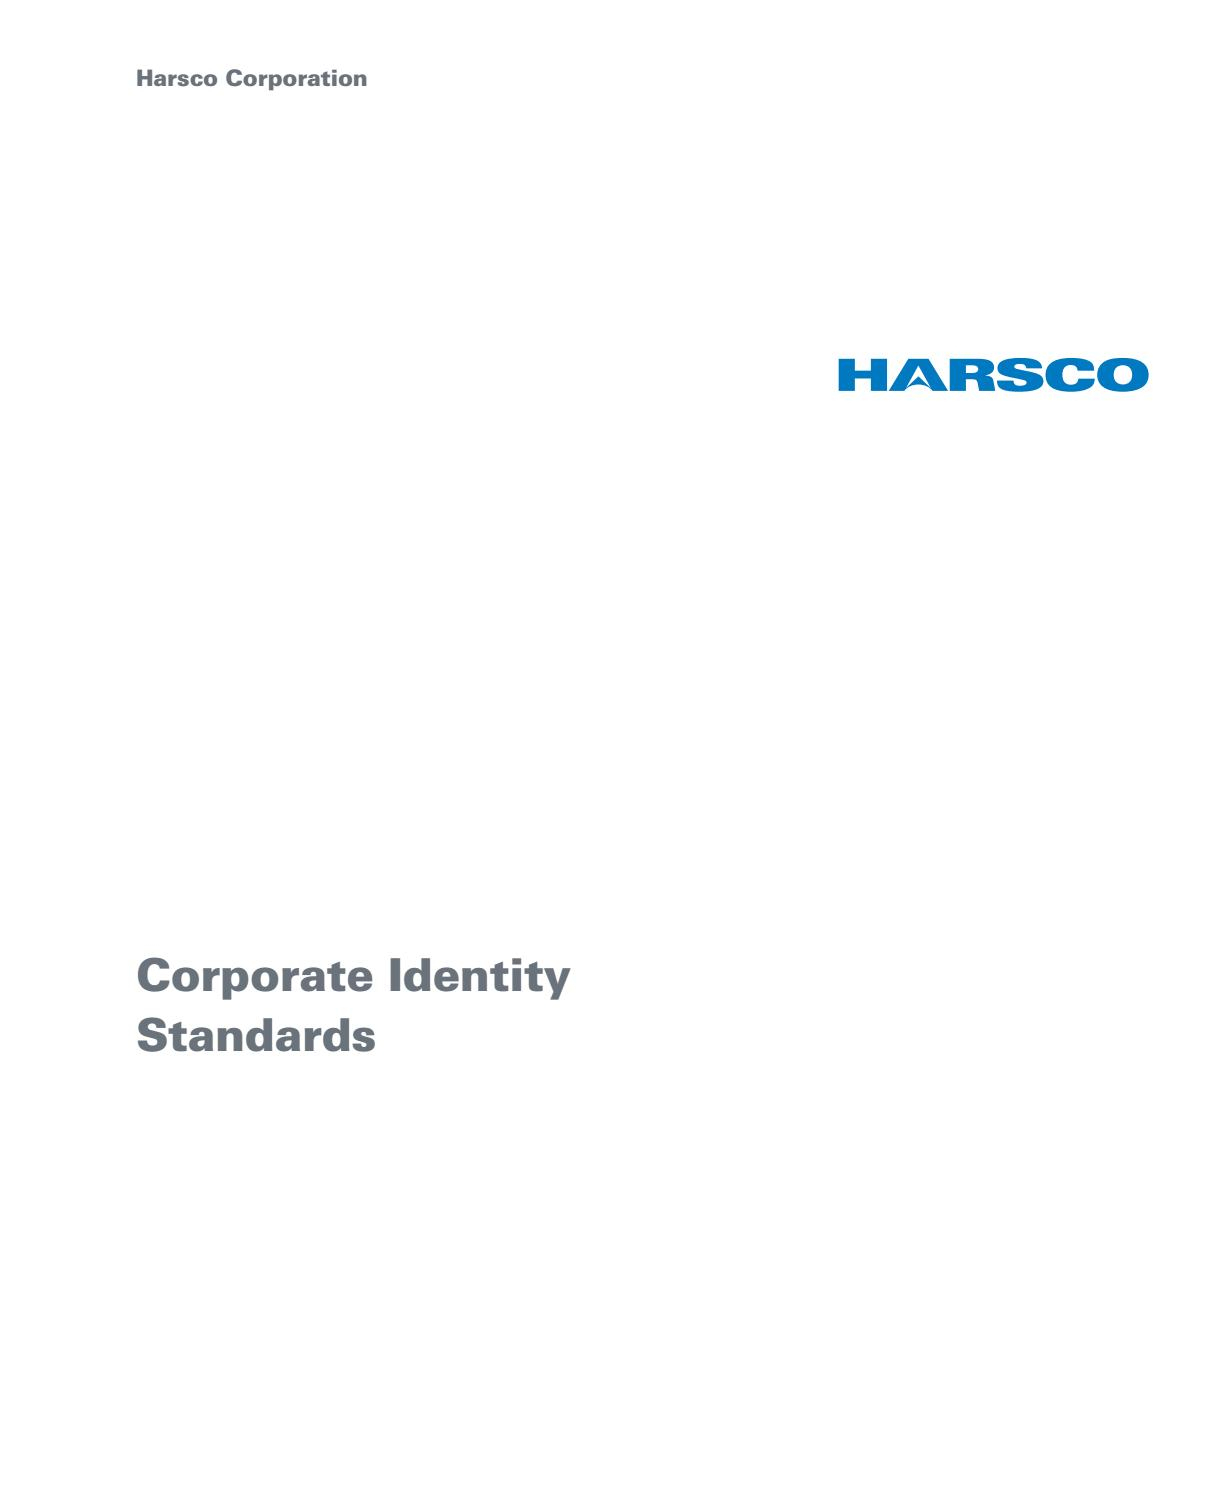 Harsco Identity Standards Manualgulzar Hussain - Issuu